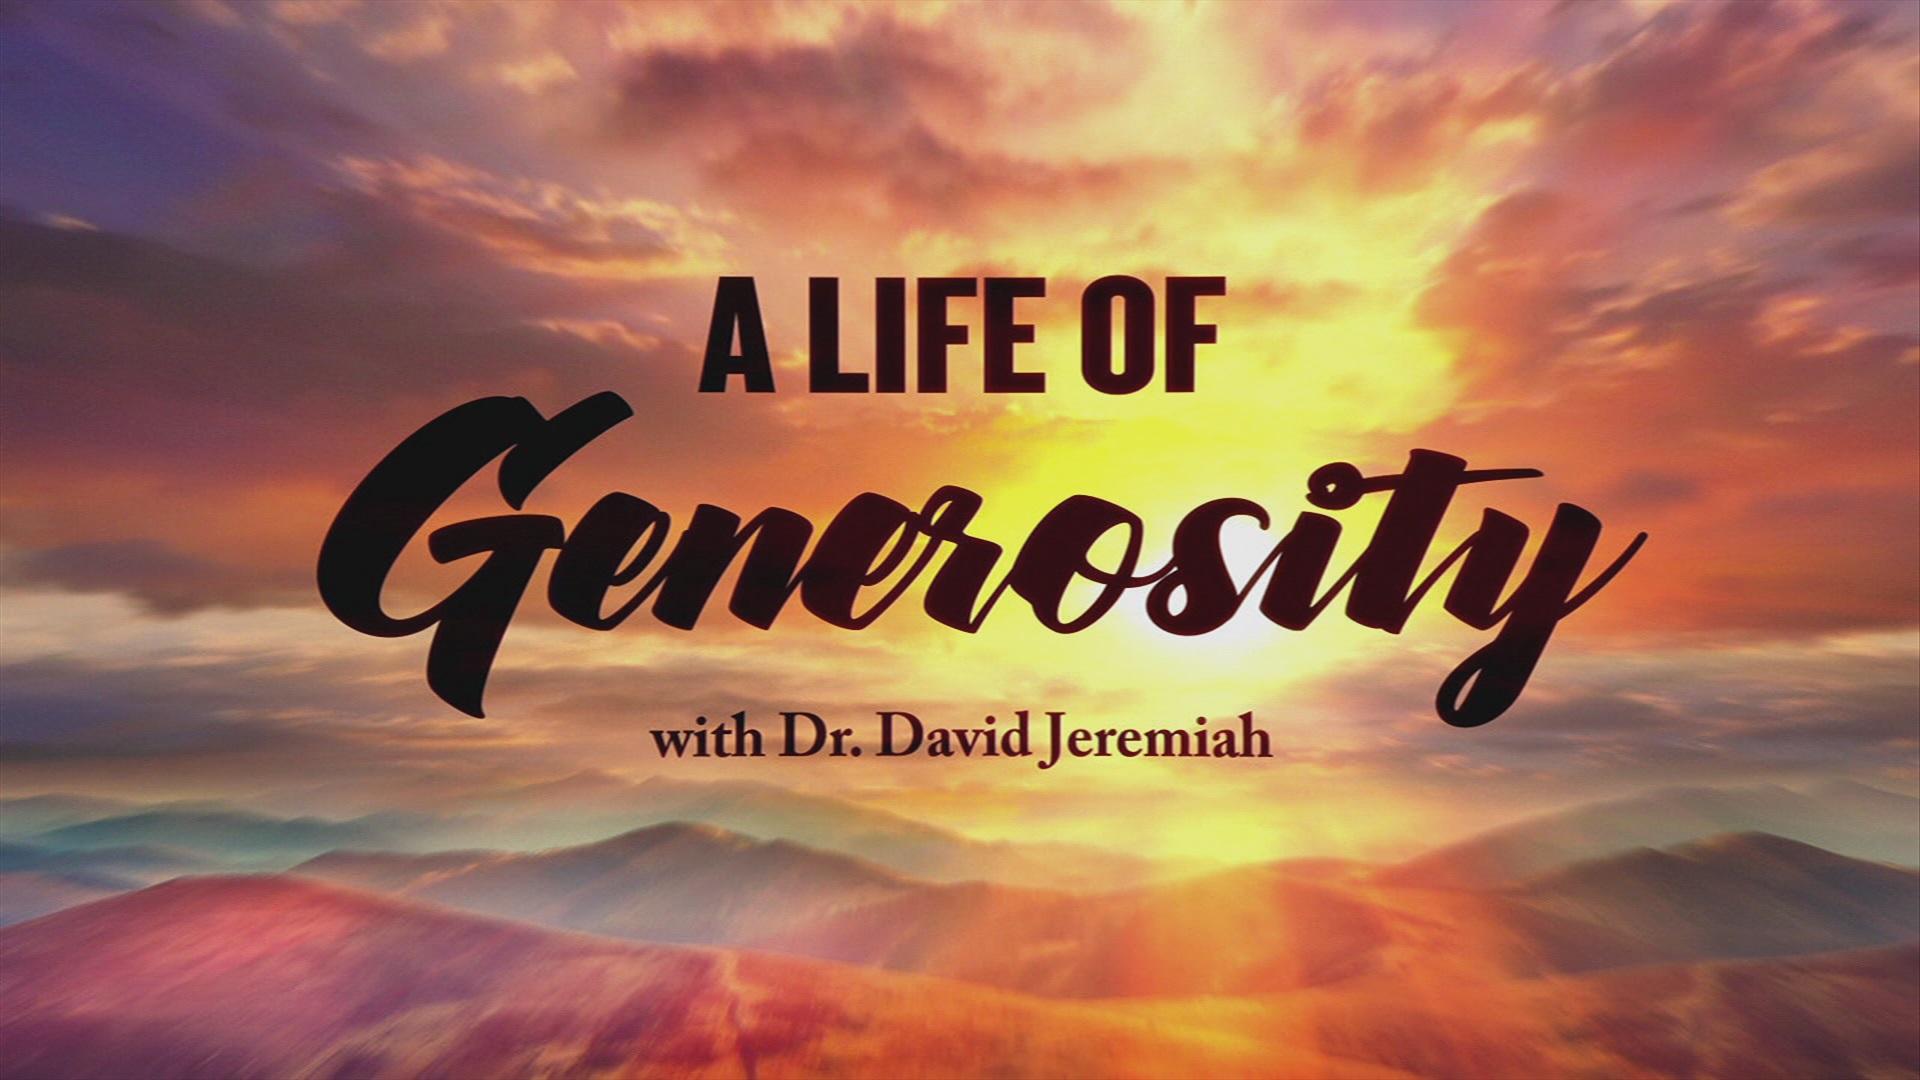 A Life of Generosity